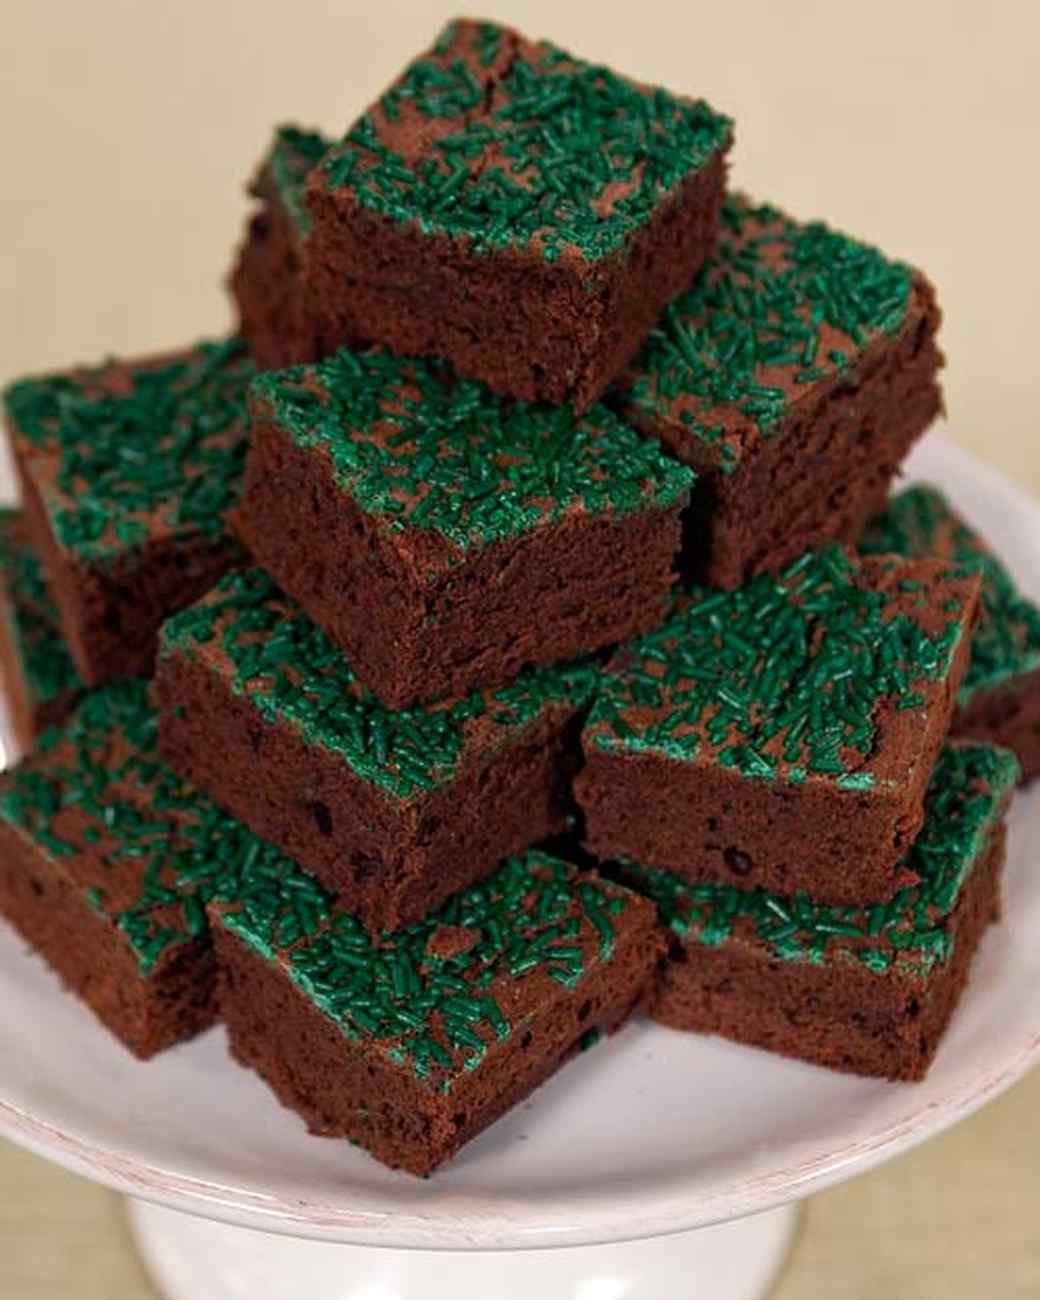 Fudgy Chocolate Brownies with Green Sprinkles